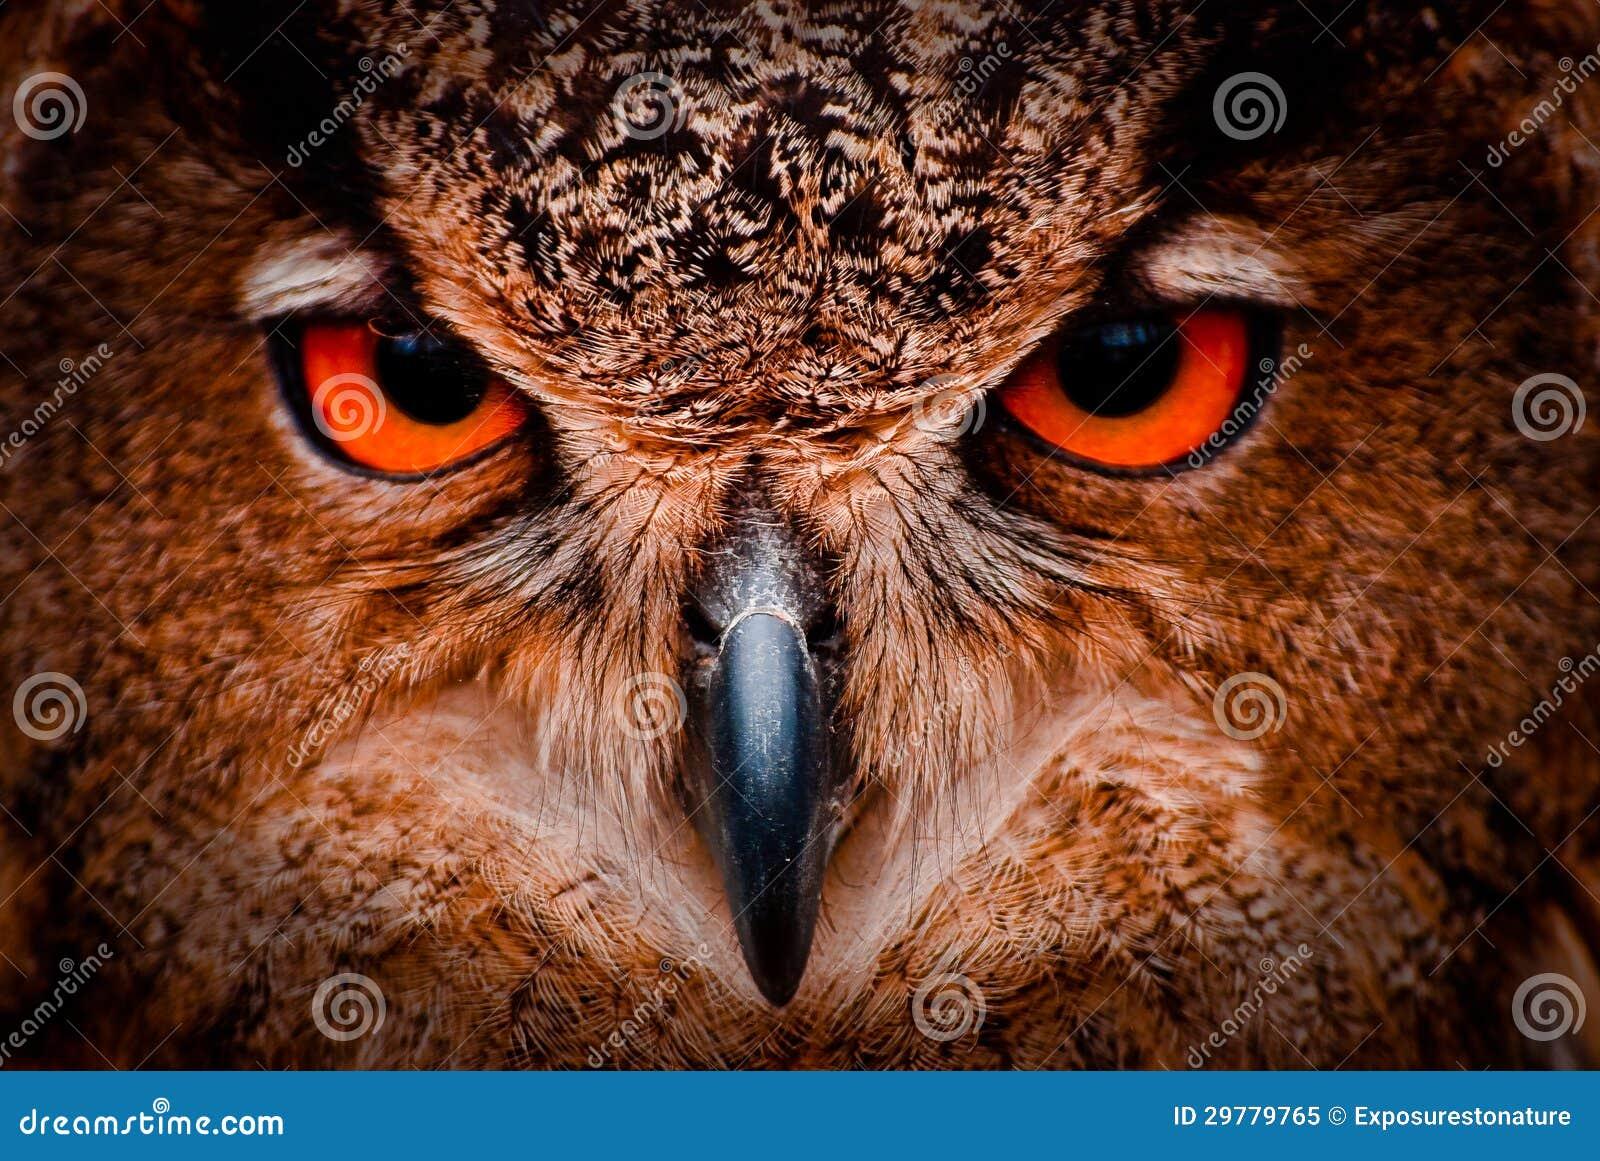 Wise Old Owl Eyes